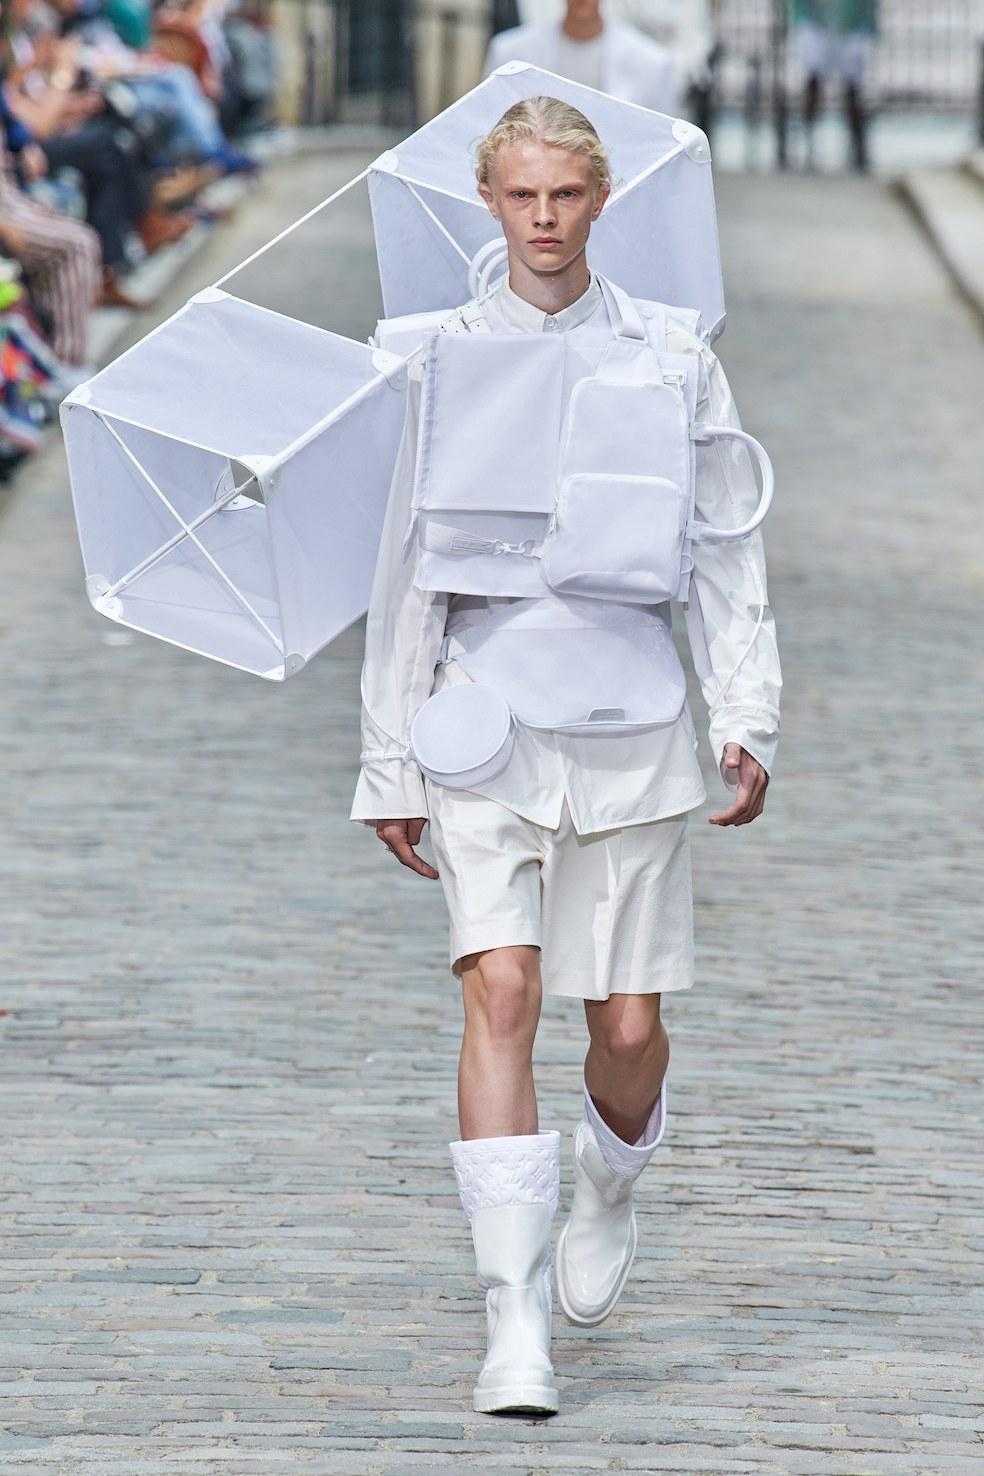 Louis_Vuitton_SS20_Behind_The_Blinds_Magazine__FIO0748.jpg